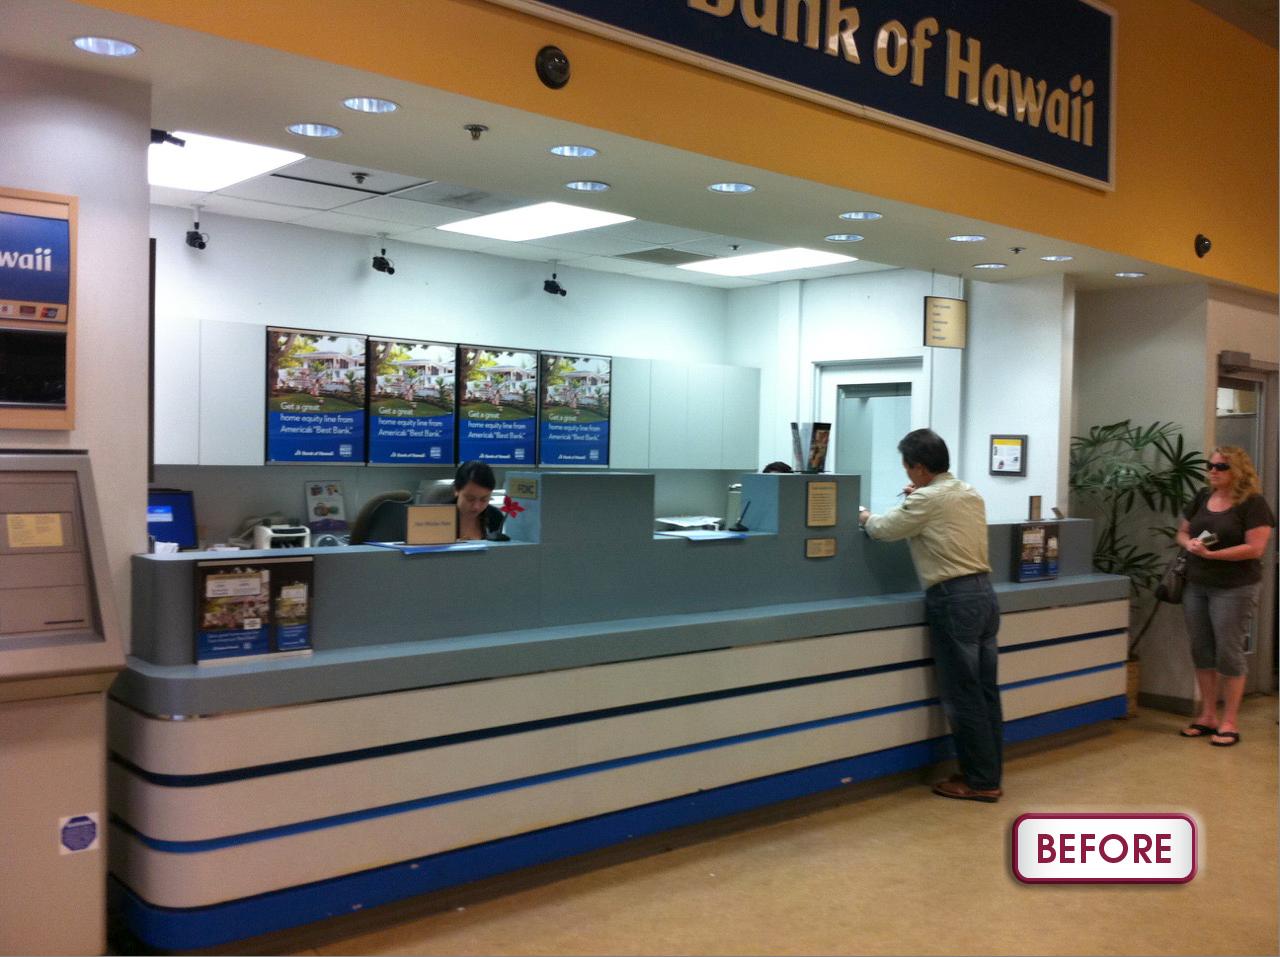 Bank Of Hawaii Hawaii Kai Safeway Branch Counter Refurbished Counter Before